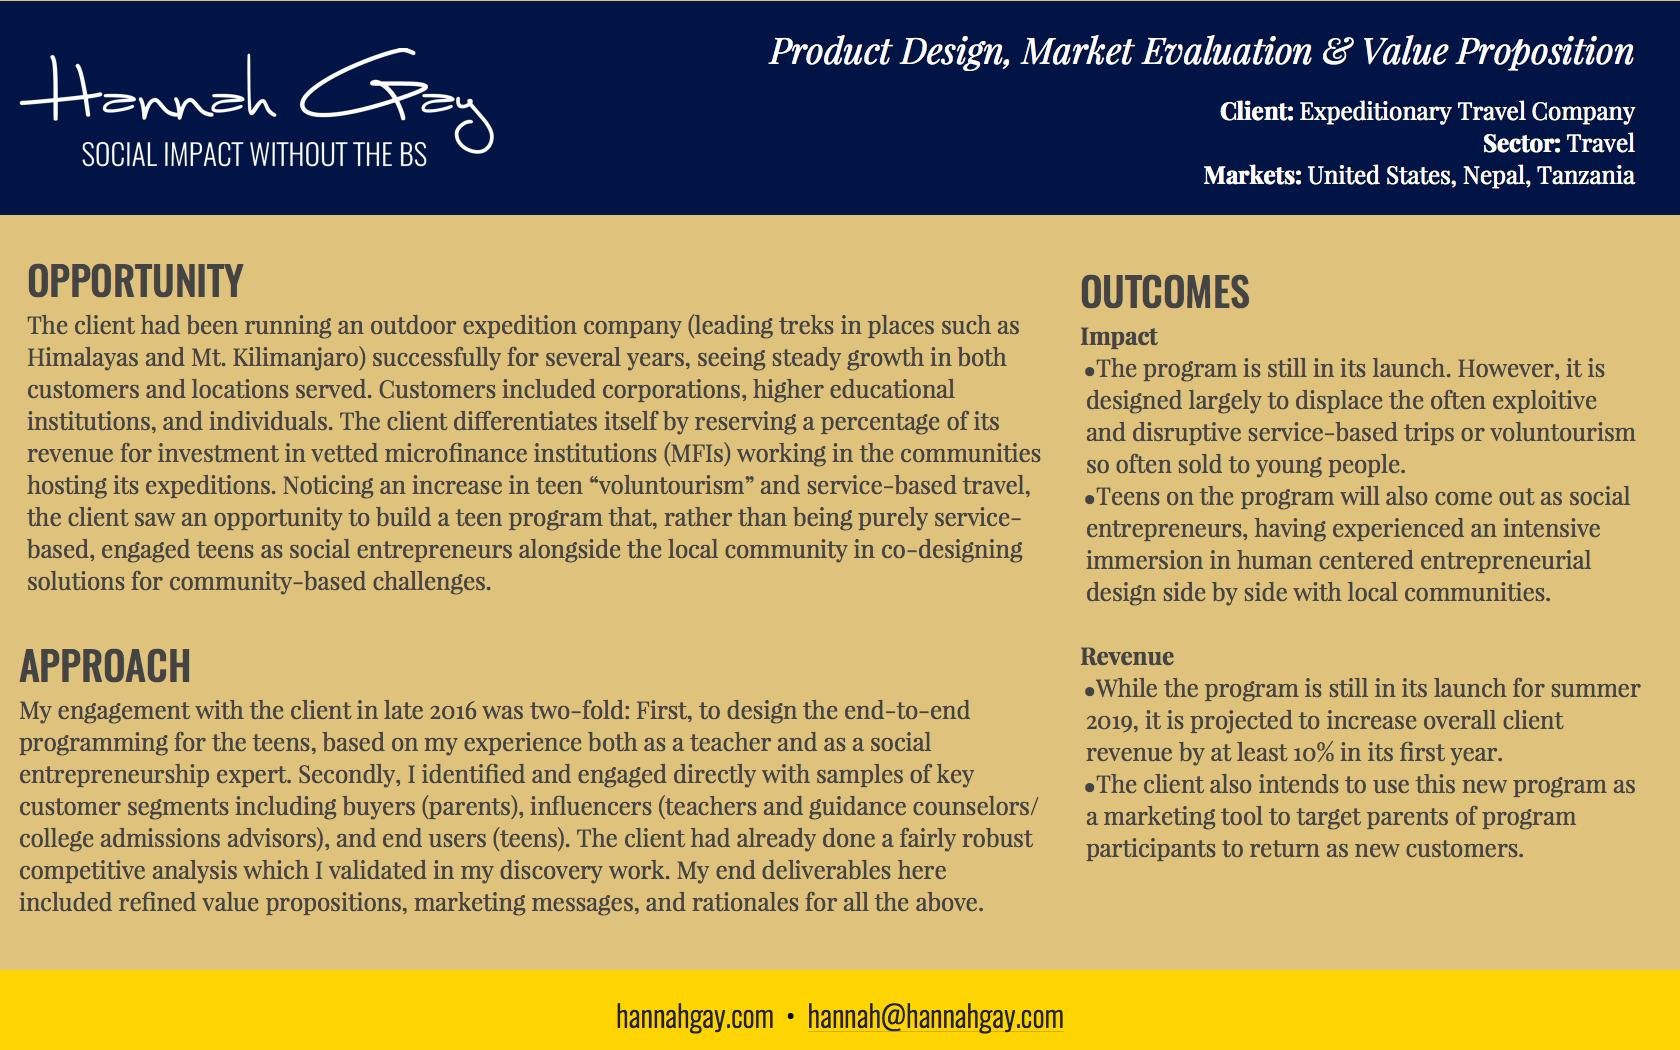 Product Design, Market Evaluation & Value Proposition.png